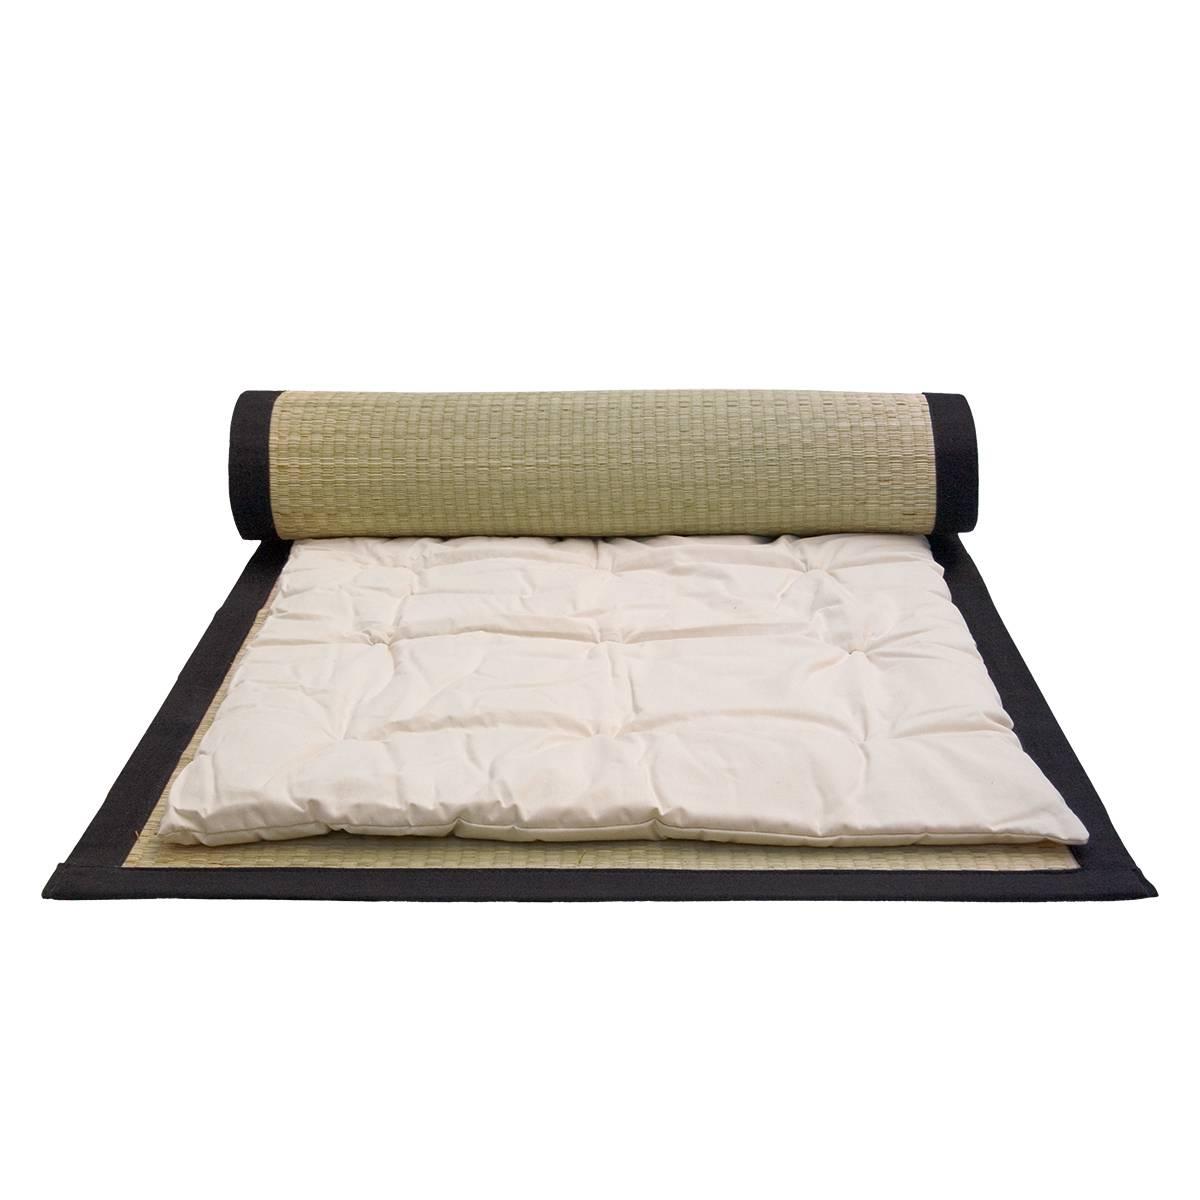 Best Sofa Beds On The Market Uk